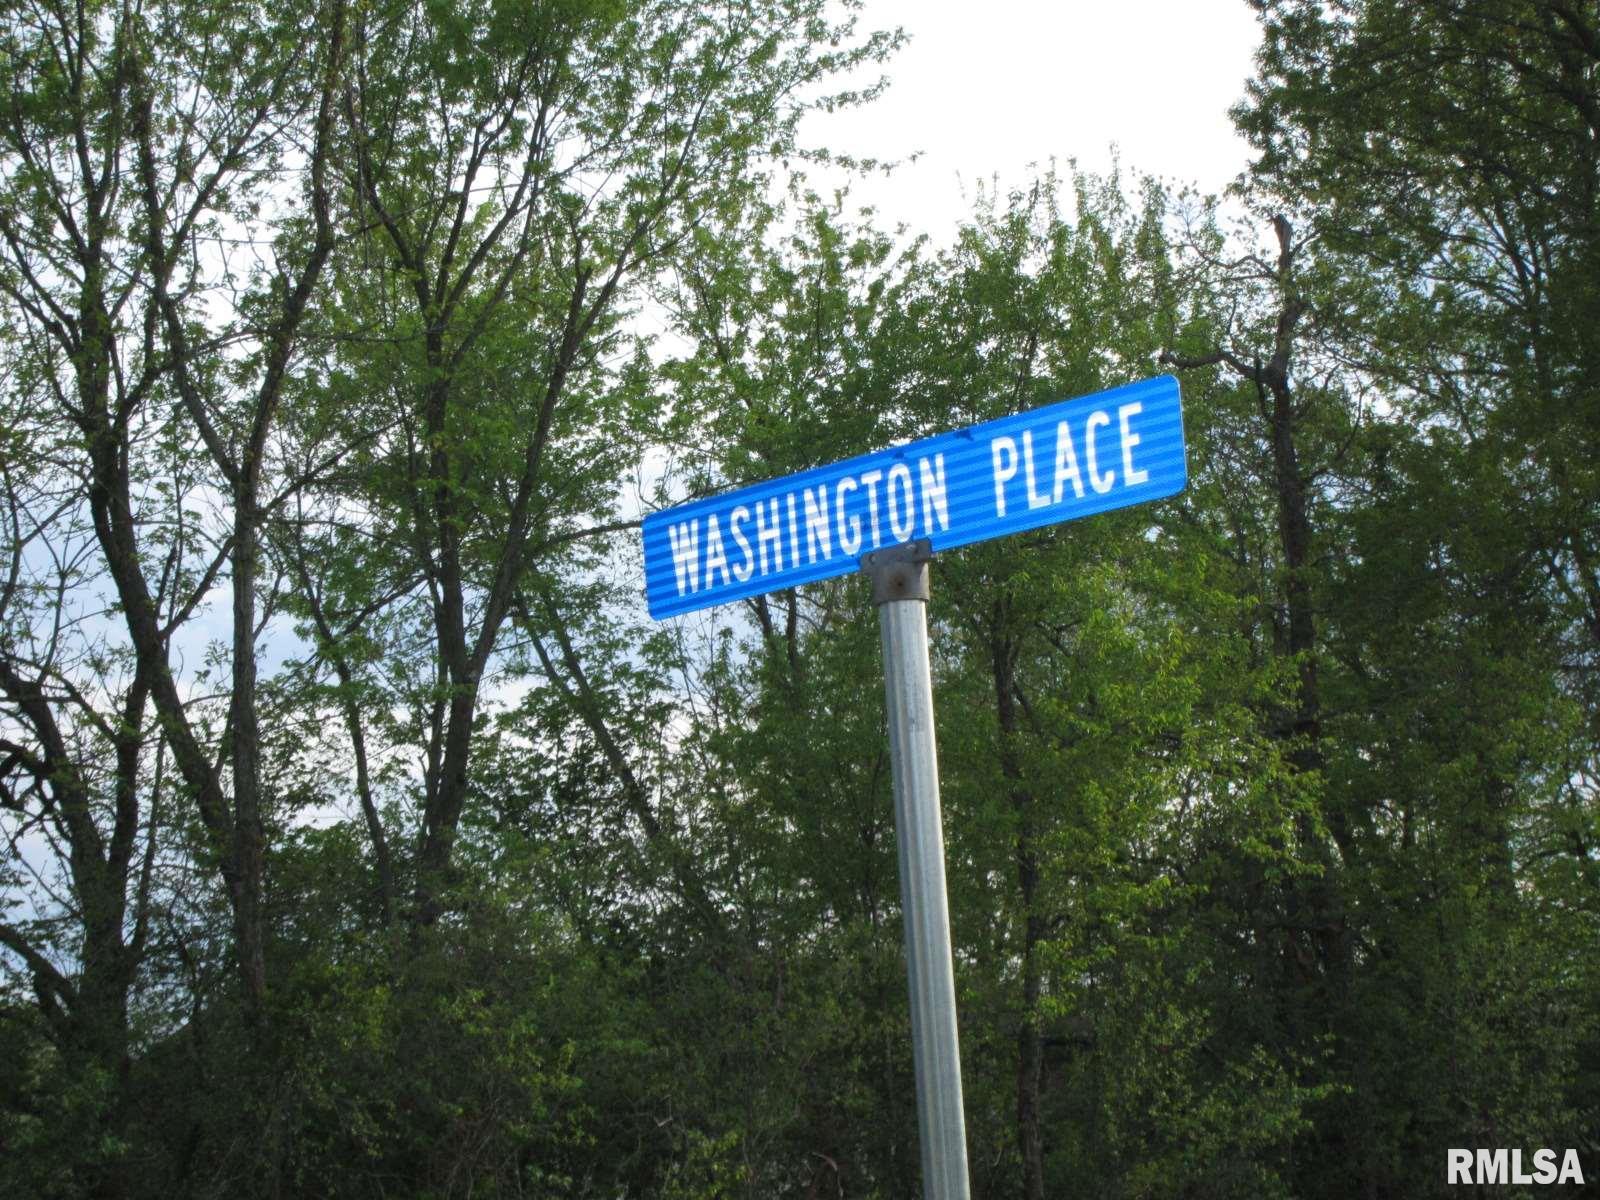 201 WASHINGTON Property Photo - Riverton, IL real estate listing